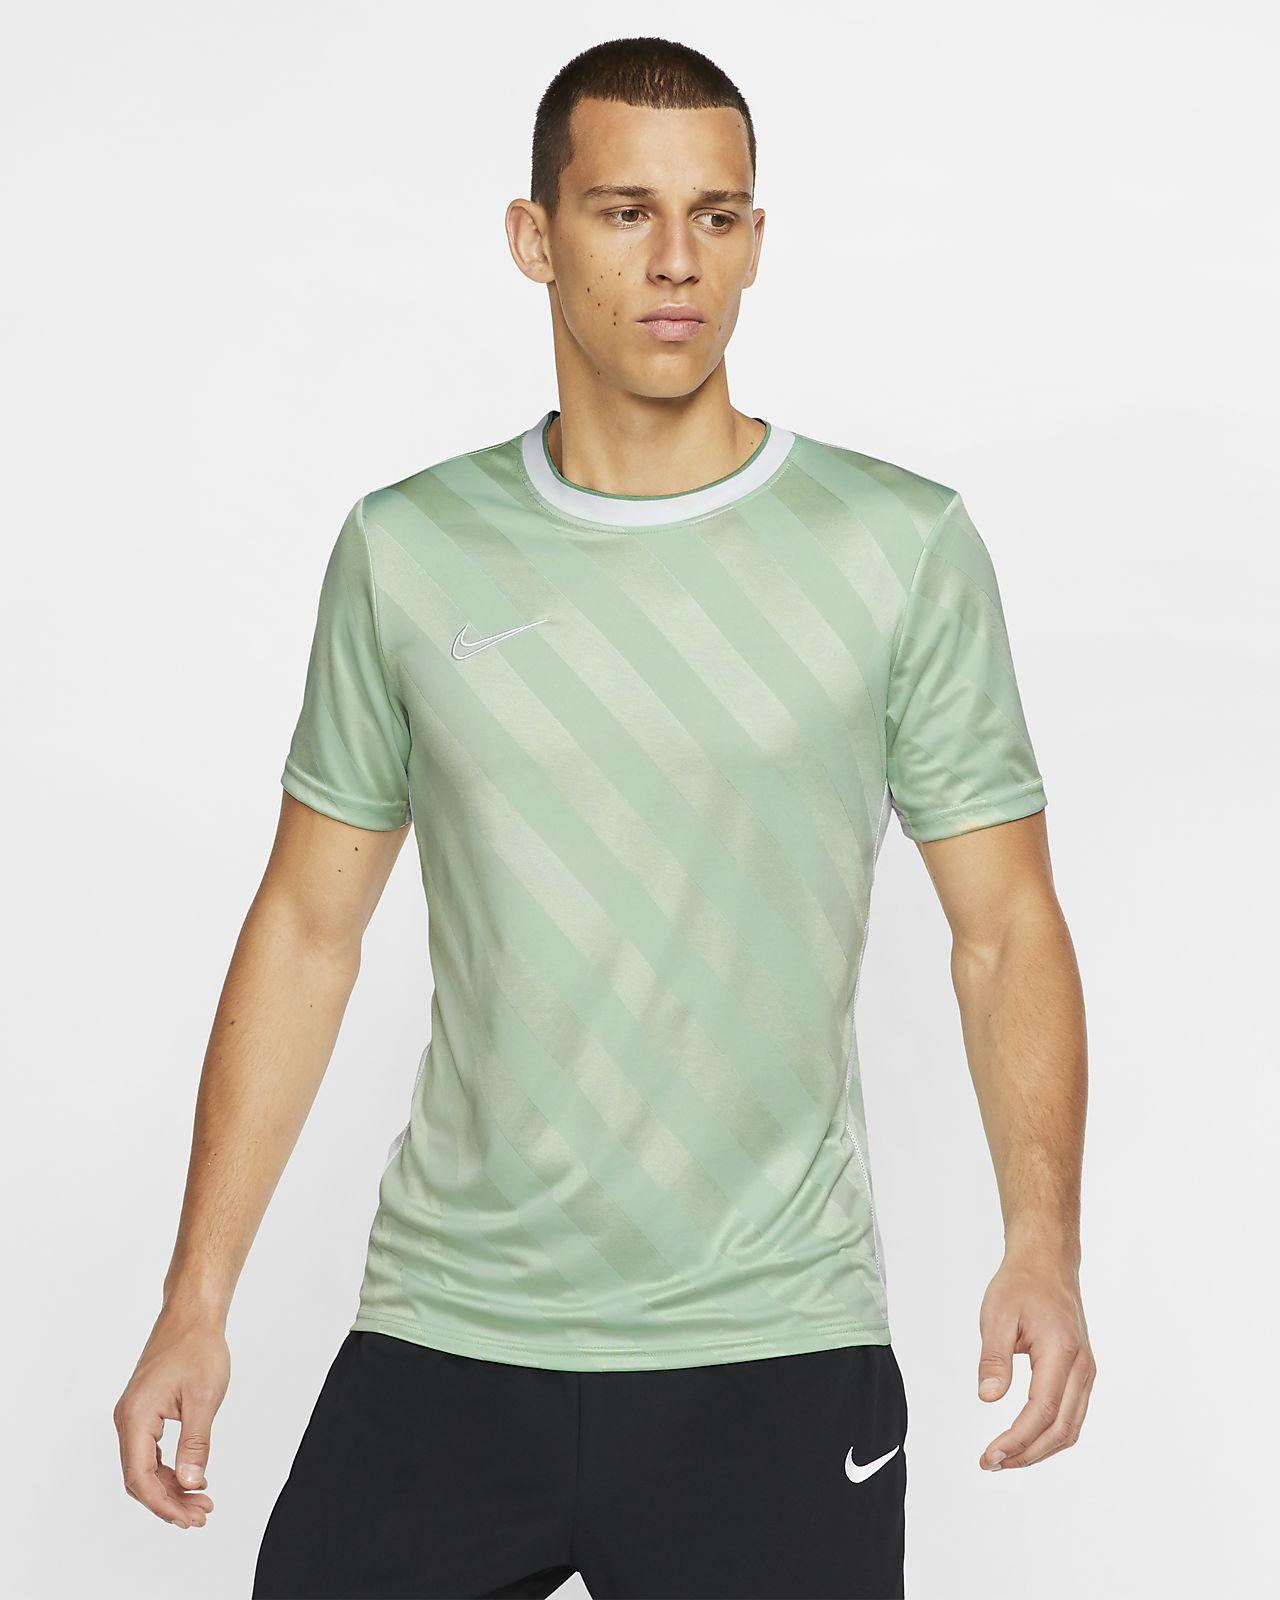 Męska koszulka piłkarska z krótkim rękawem Nike Breathe Academy